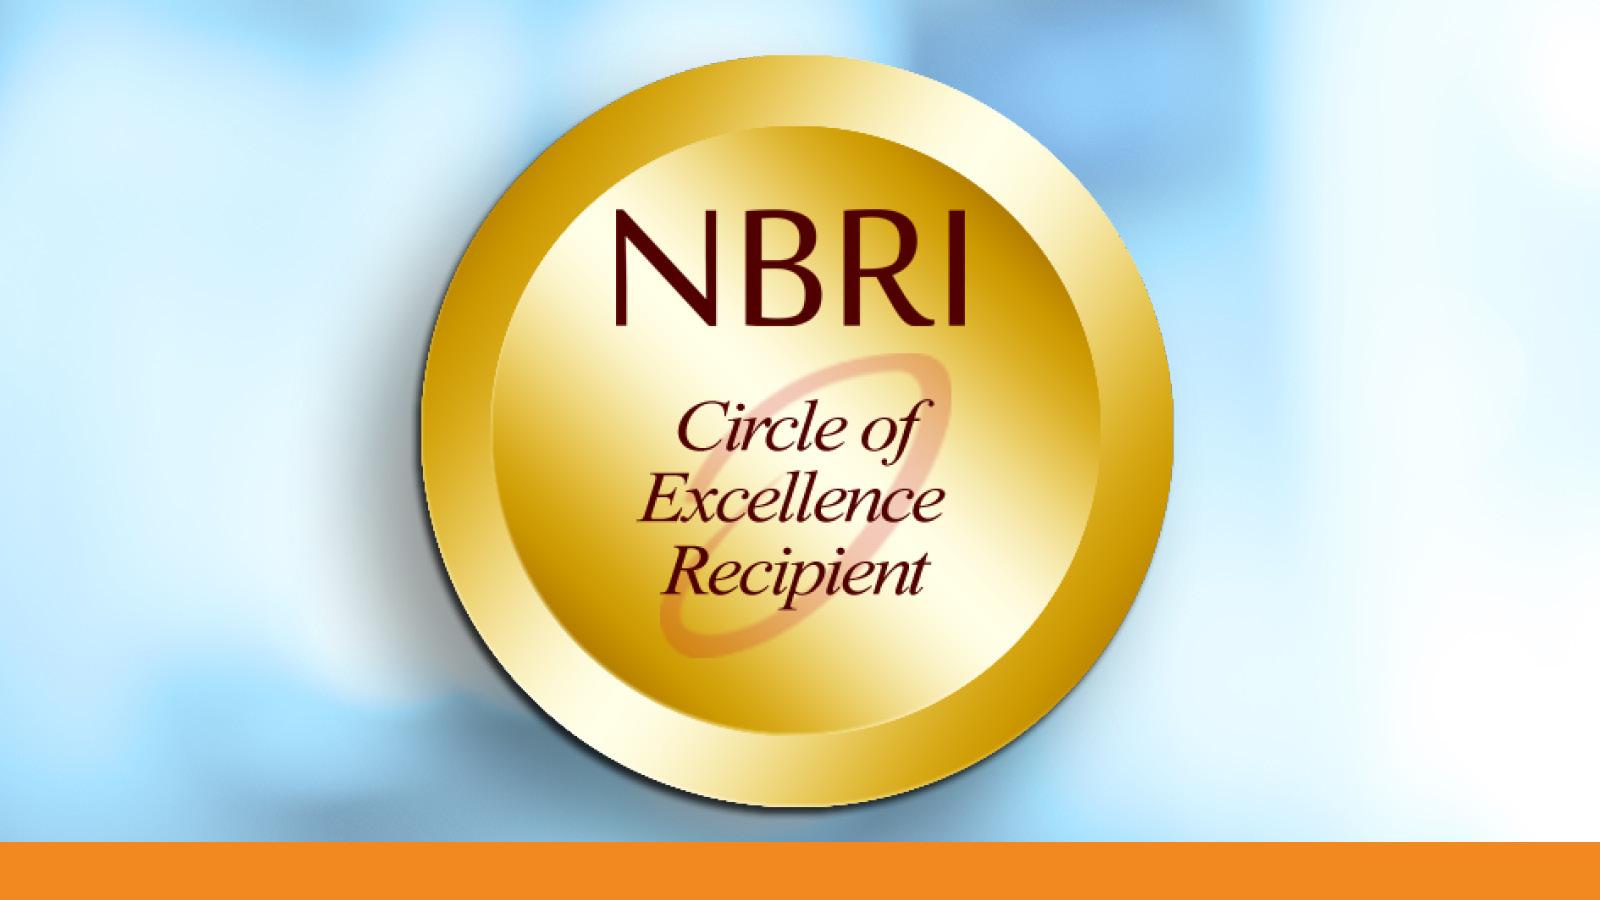 PR_NBRI-Reinvent0120_Web_Header